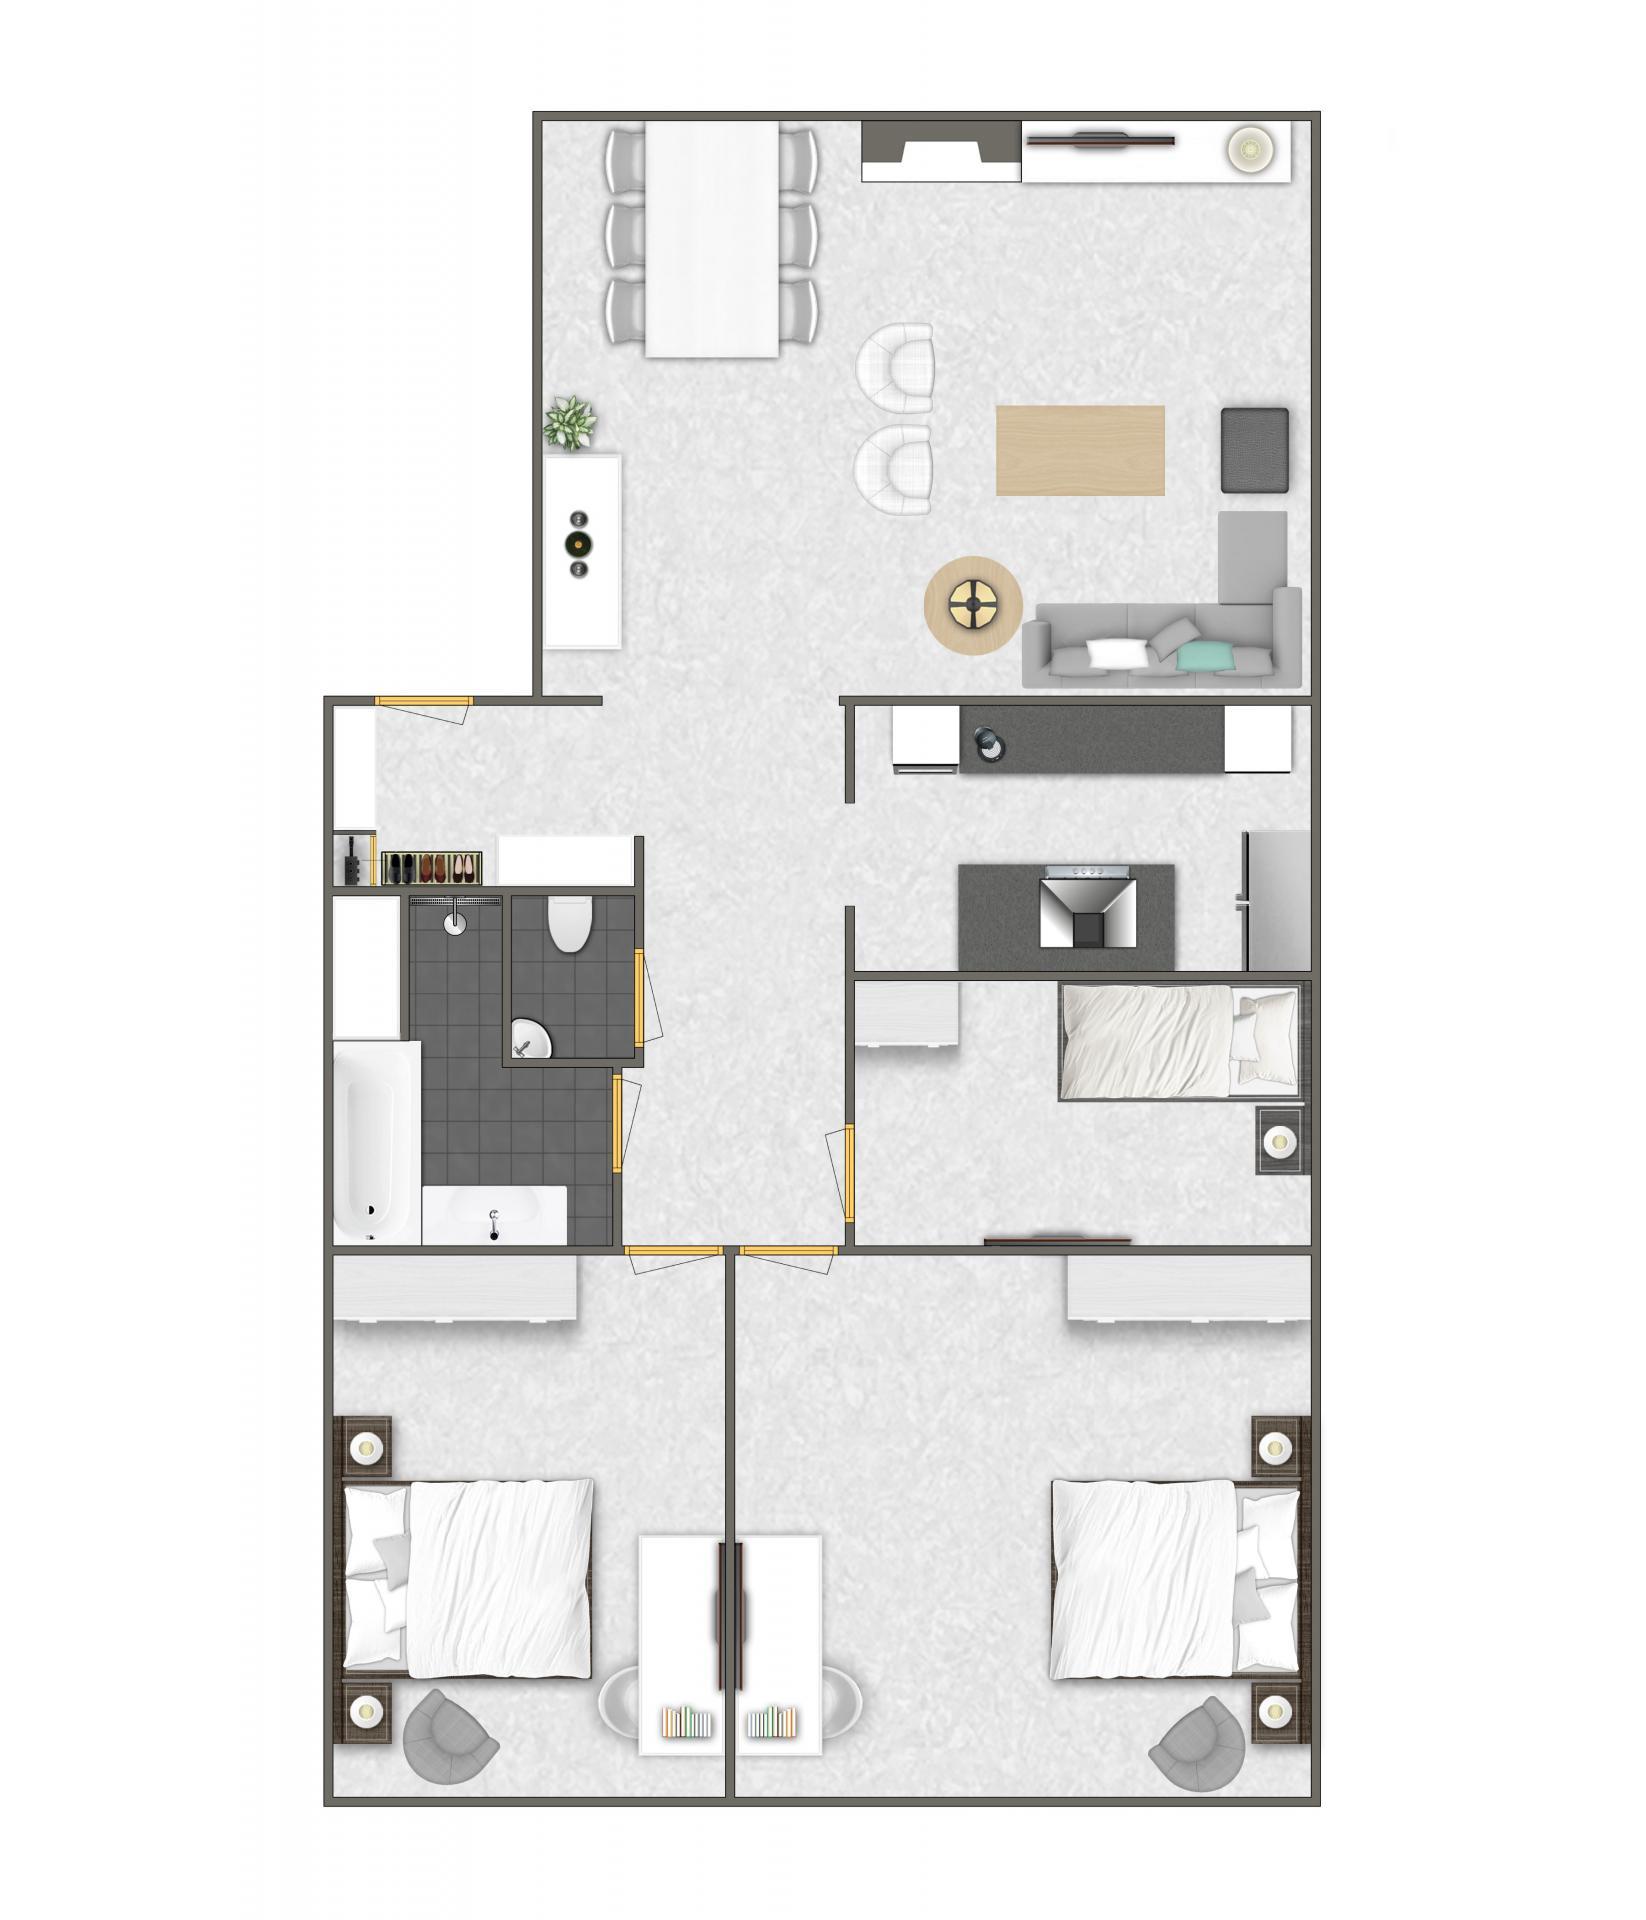 3 bed floor plan at Htel Amsterdam Buitenveldert